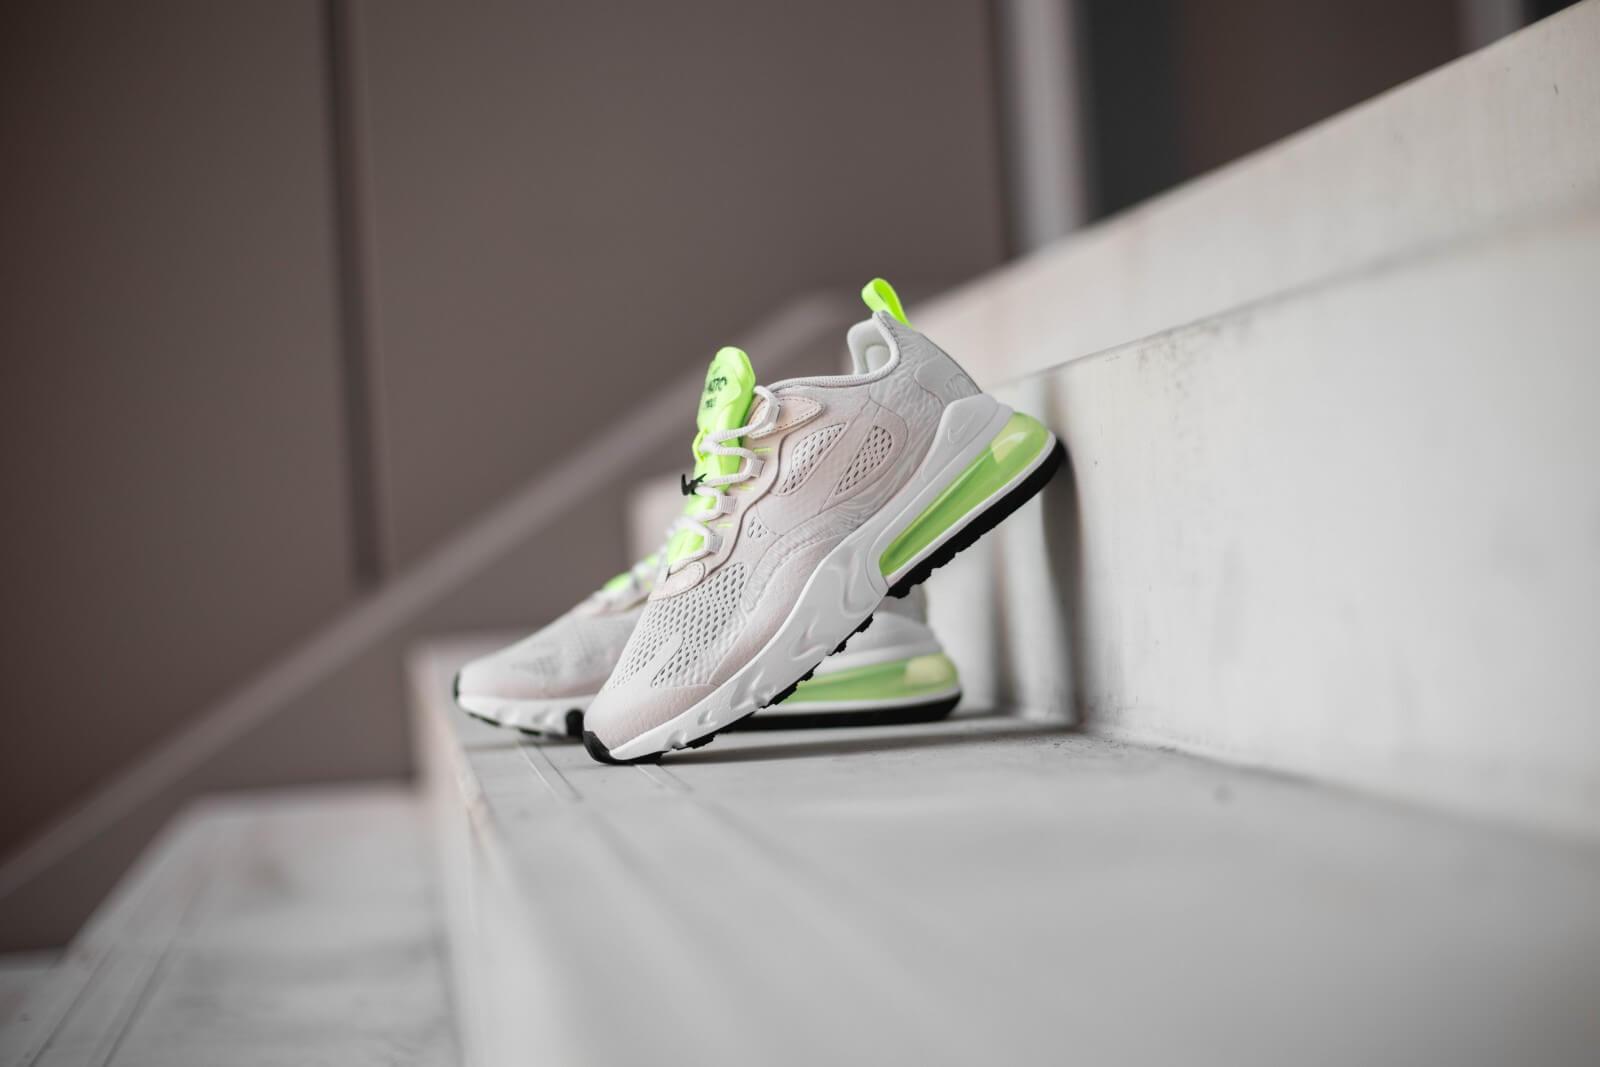 Nike Women S Air Max 270 React Vast Grey Ghost Green Cu3447 001